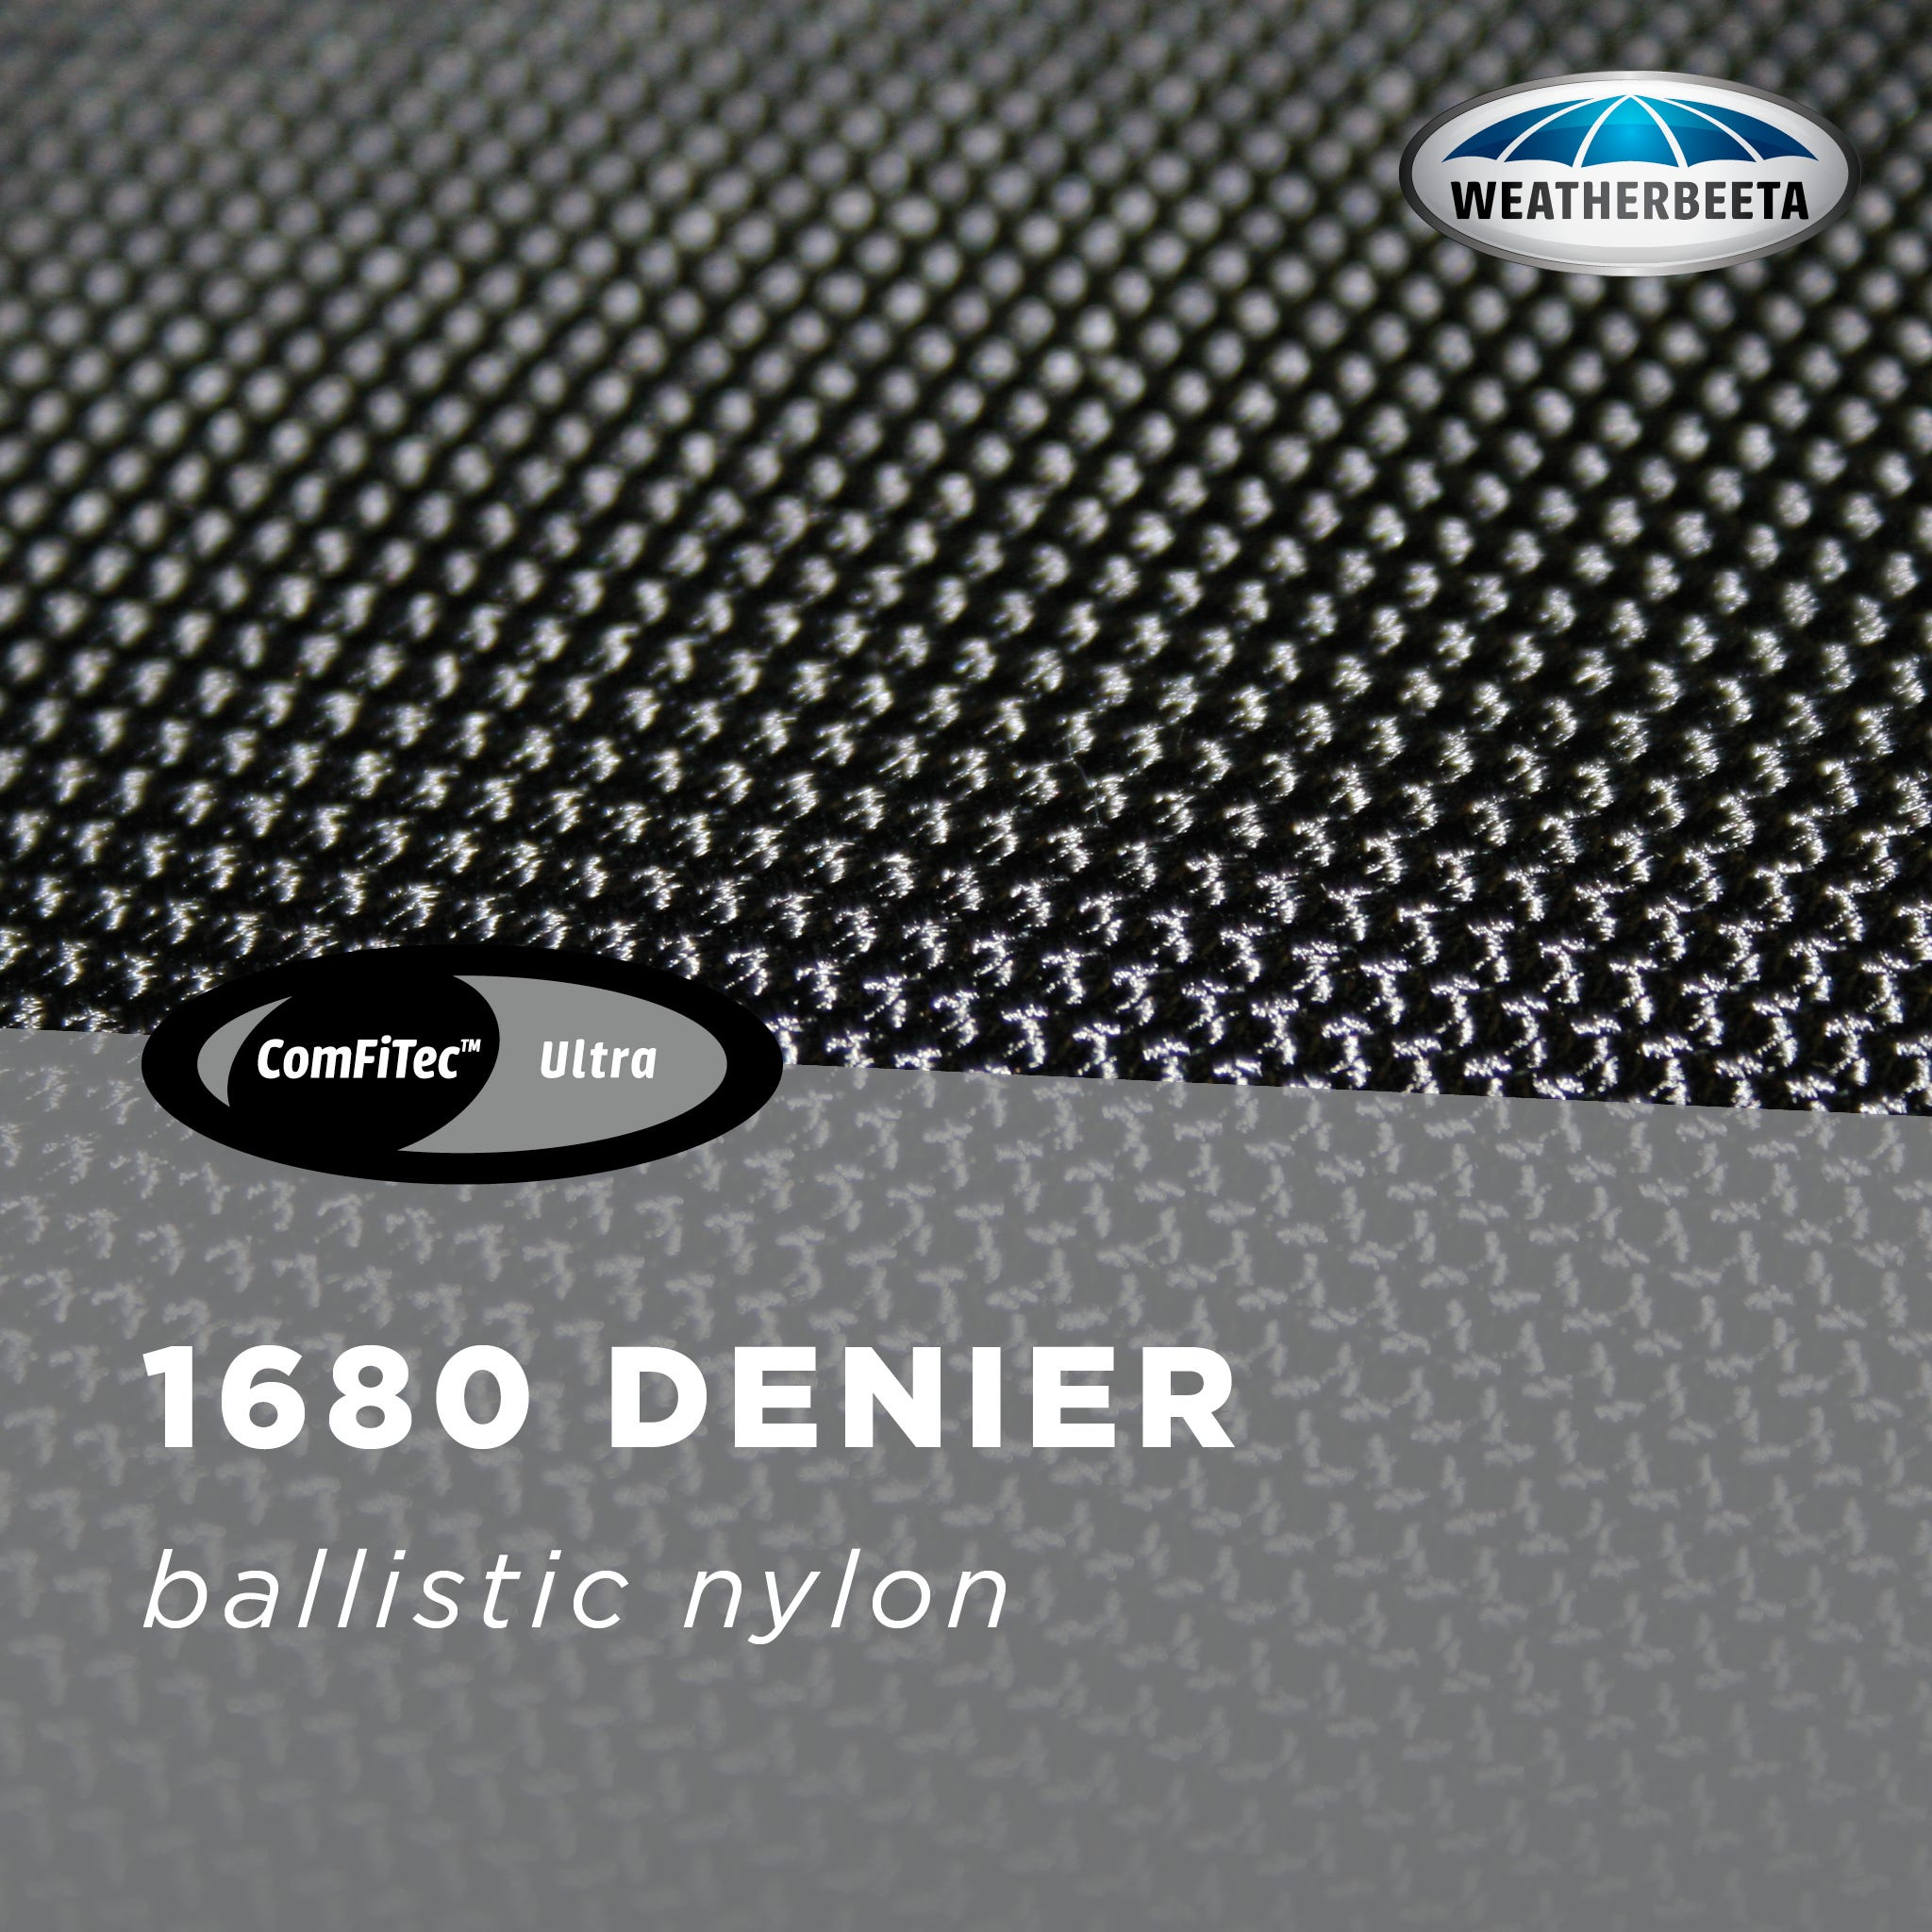 ComFiTec Ultra 1680 Denier